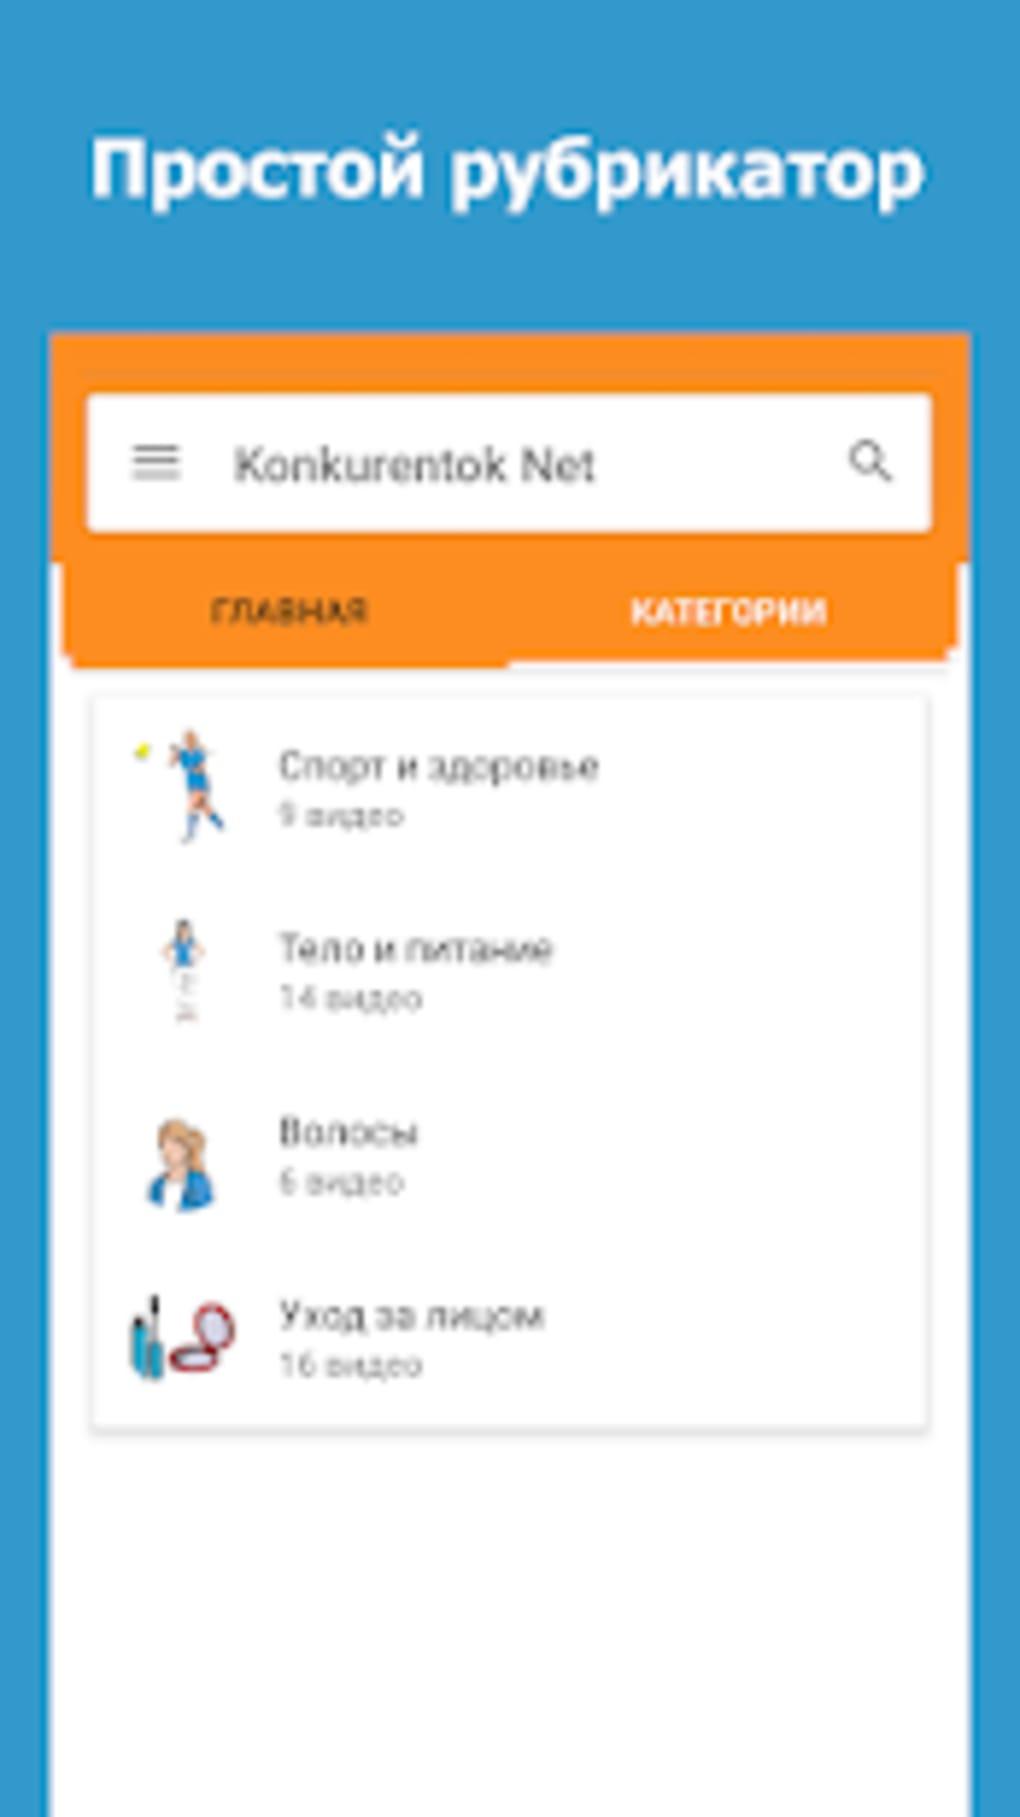 Konkurentok Net Zhenskij Klub Apk For Android Download